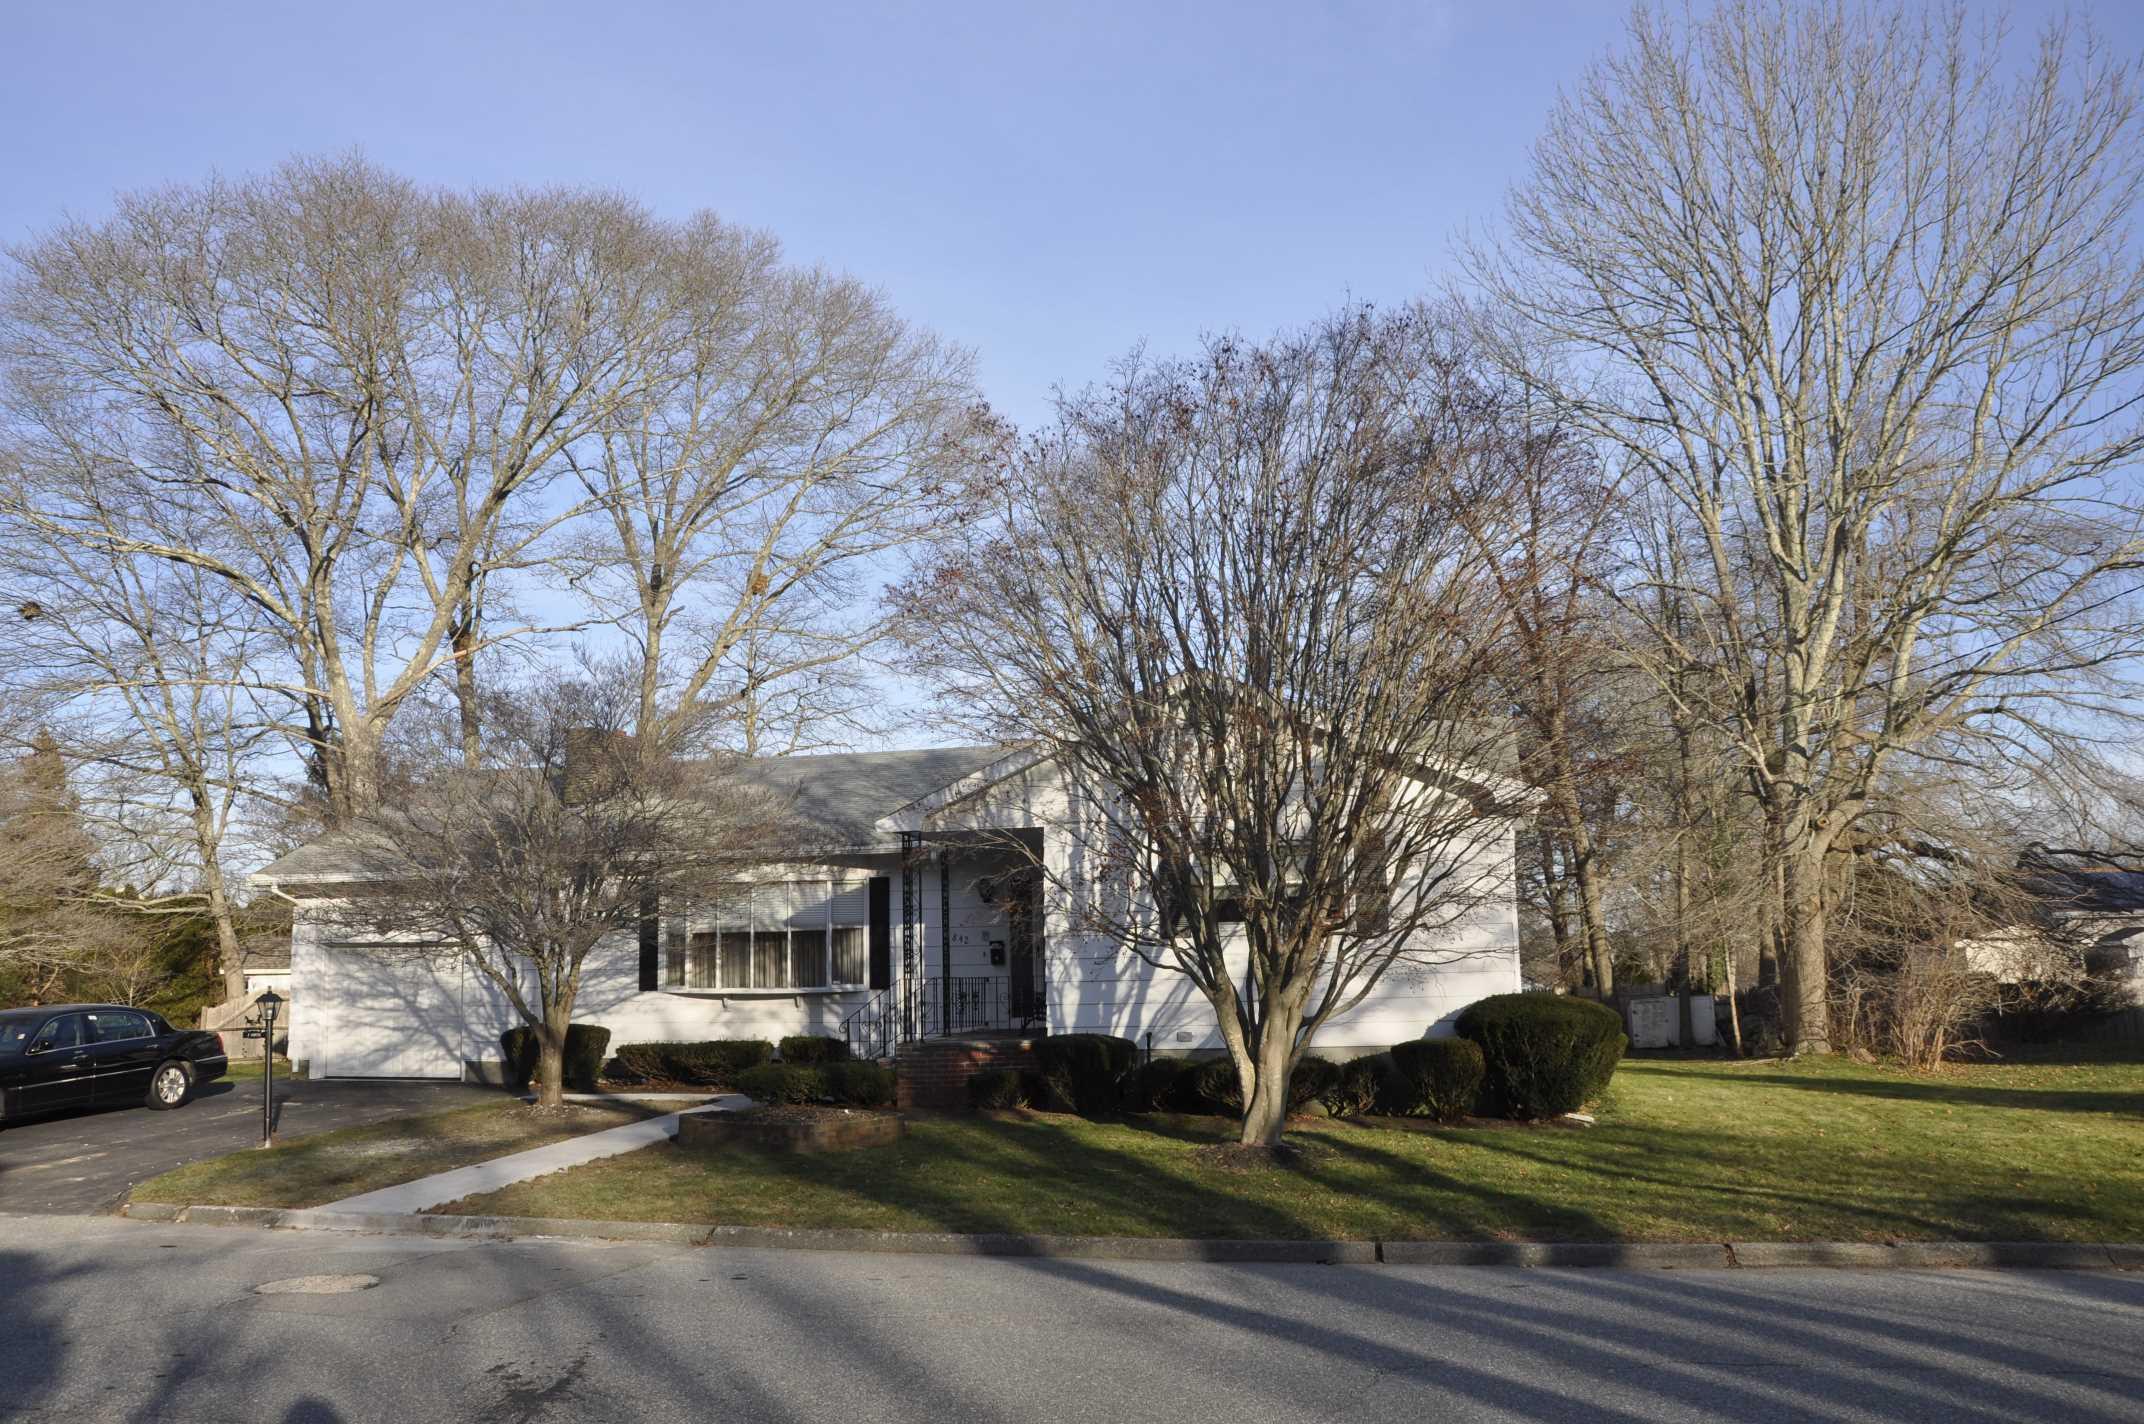 842 Tradewind St, New Bedford, Massachusetts 02740